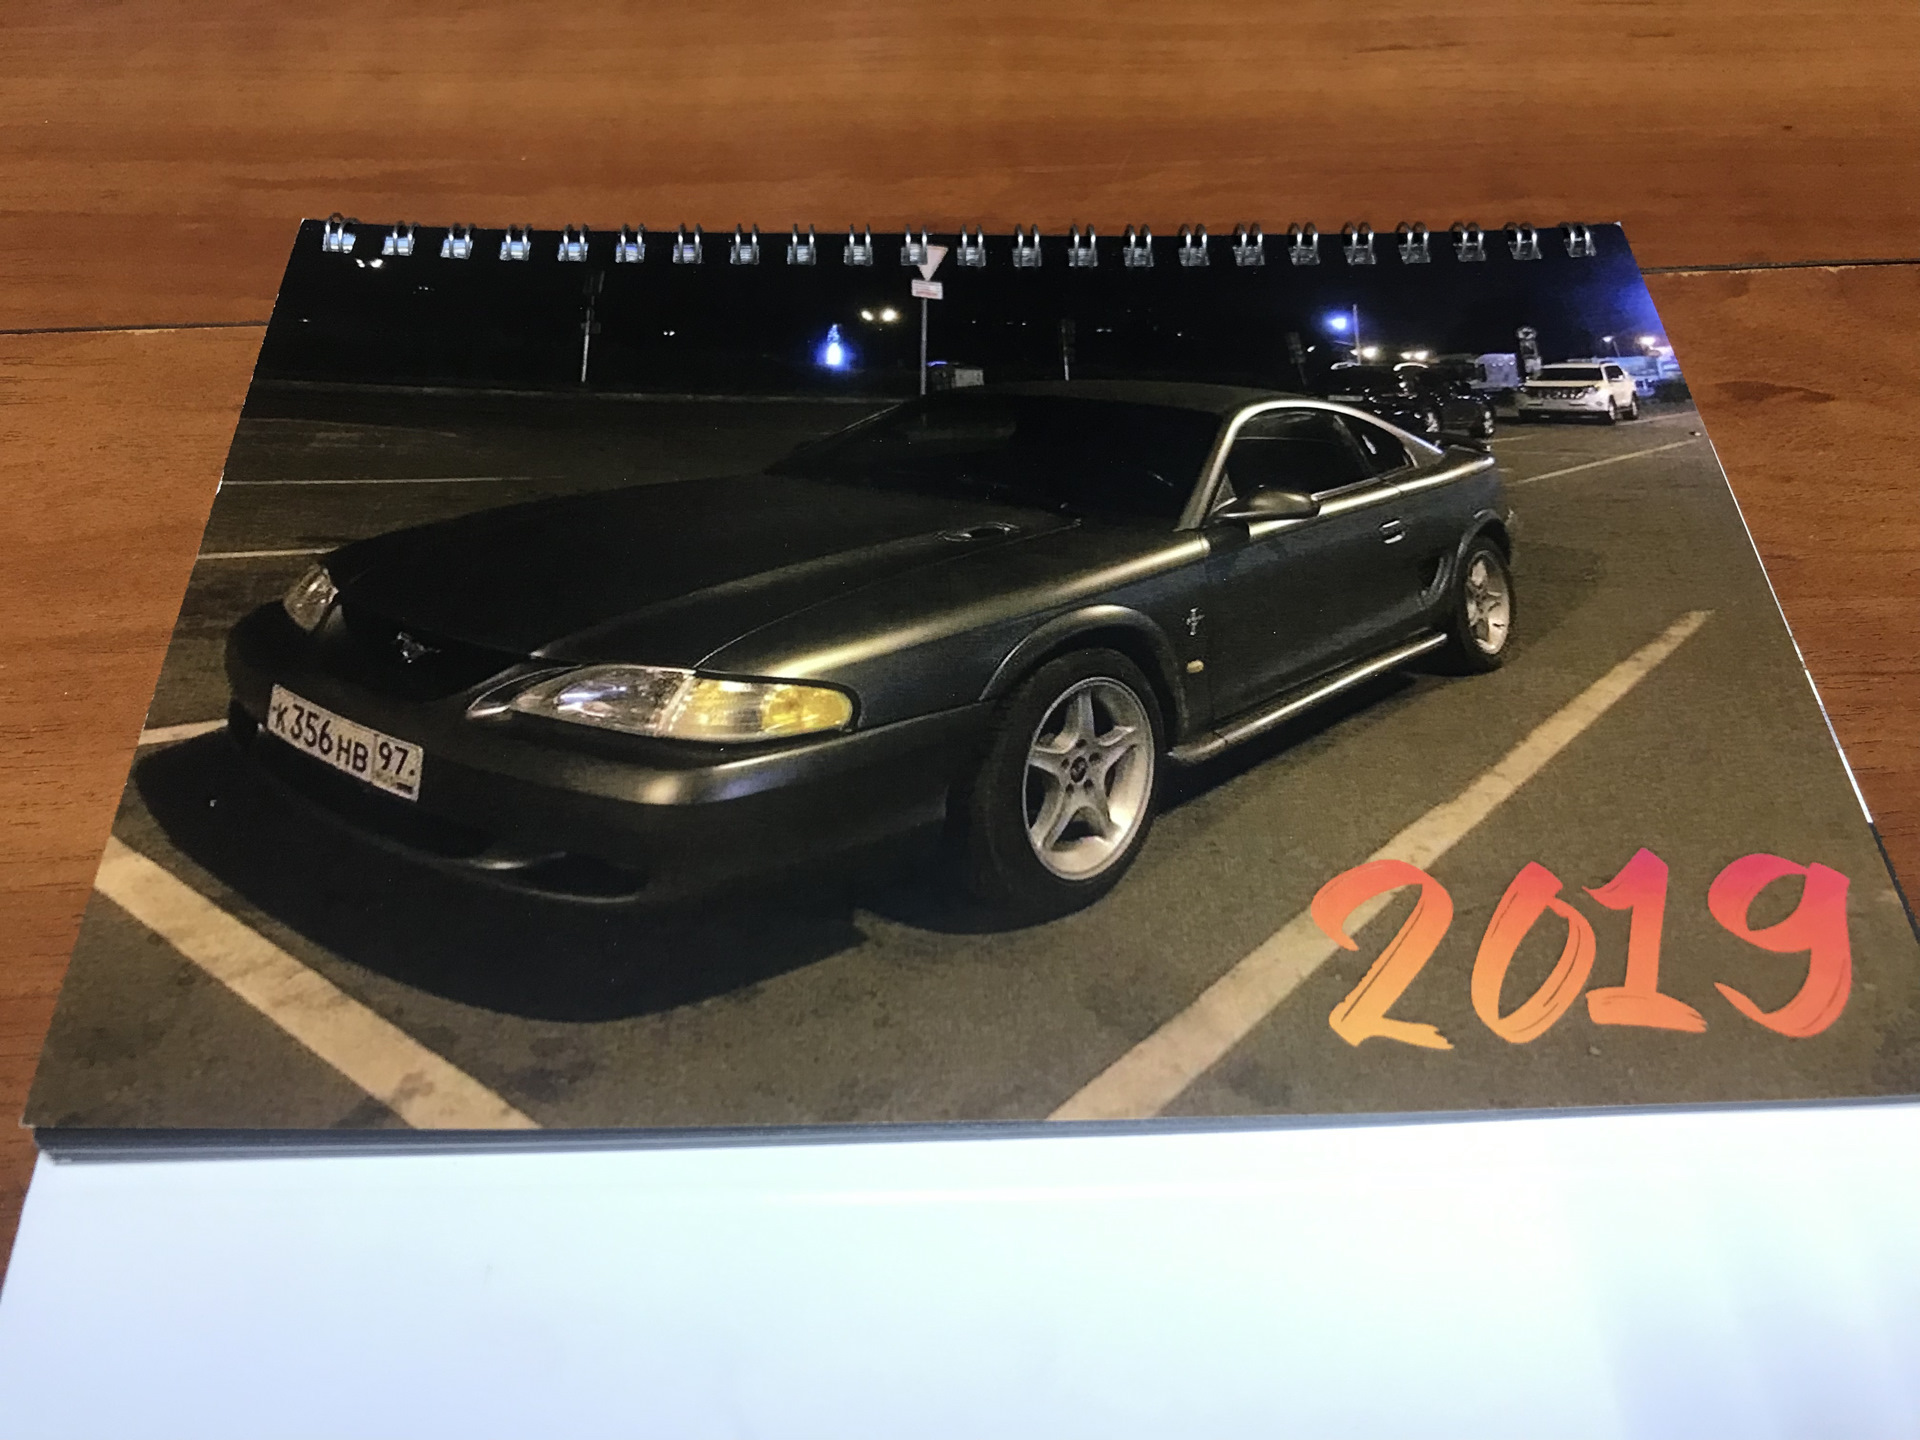 Ford mustang 2019 года - КалендарьГода новые фото